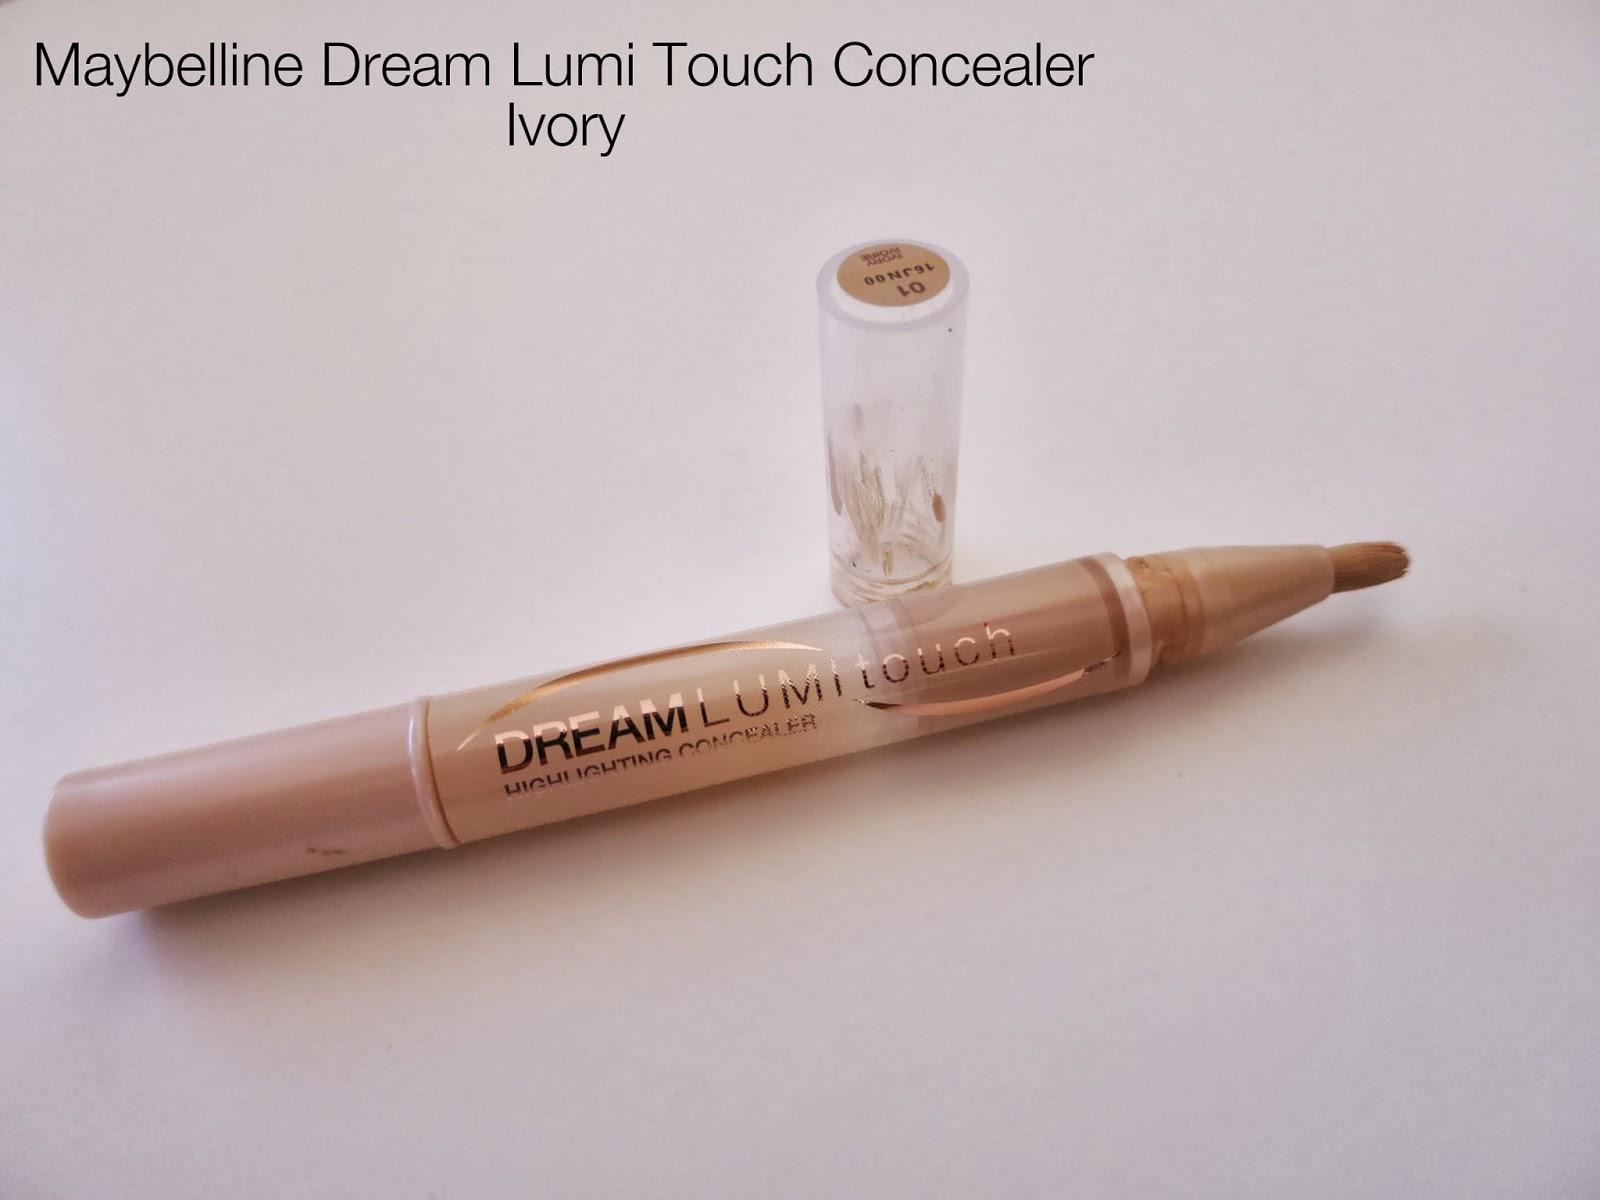 maybelline dream lumi touch concealer, 5 best under eye concealers